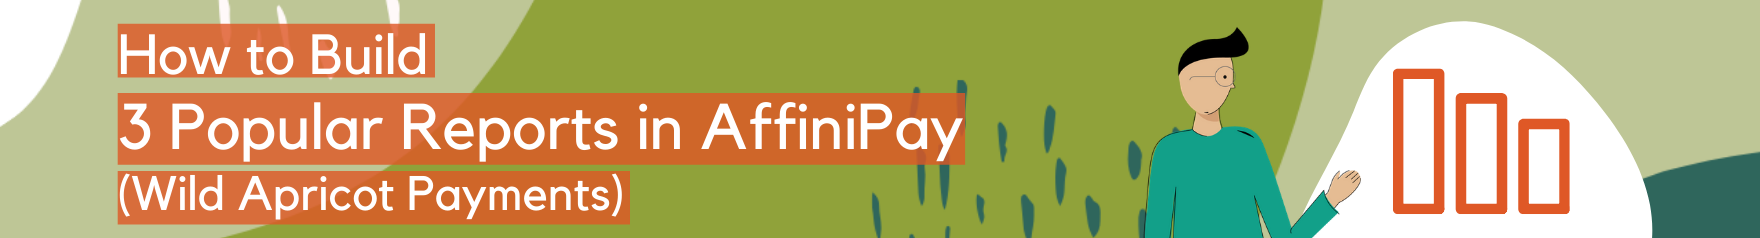 https://www.wildapricot.com/blogs/newsblog/2018/03/12/wild-apricot-payment-processor?utm_source=web&utm_medium=in-post&utm_campaign=banner